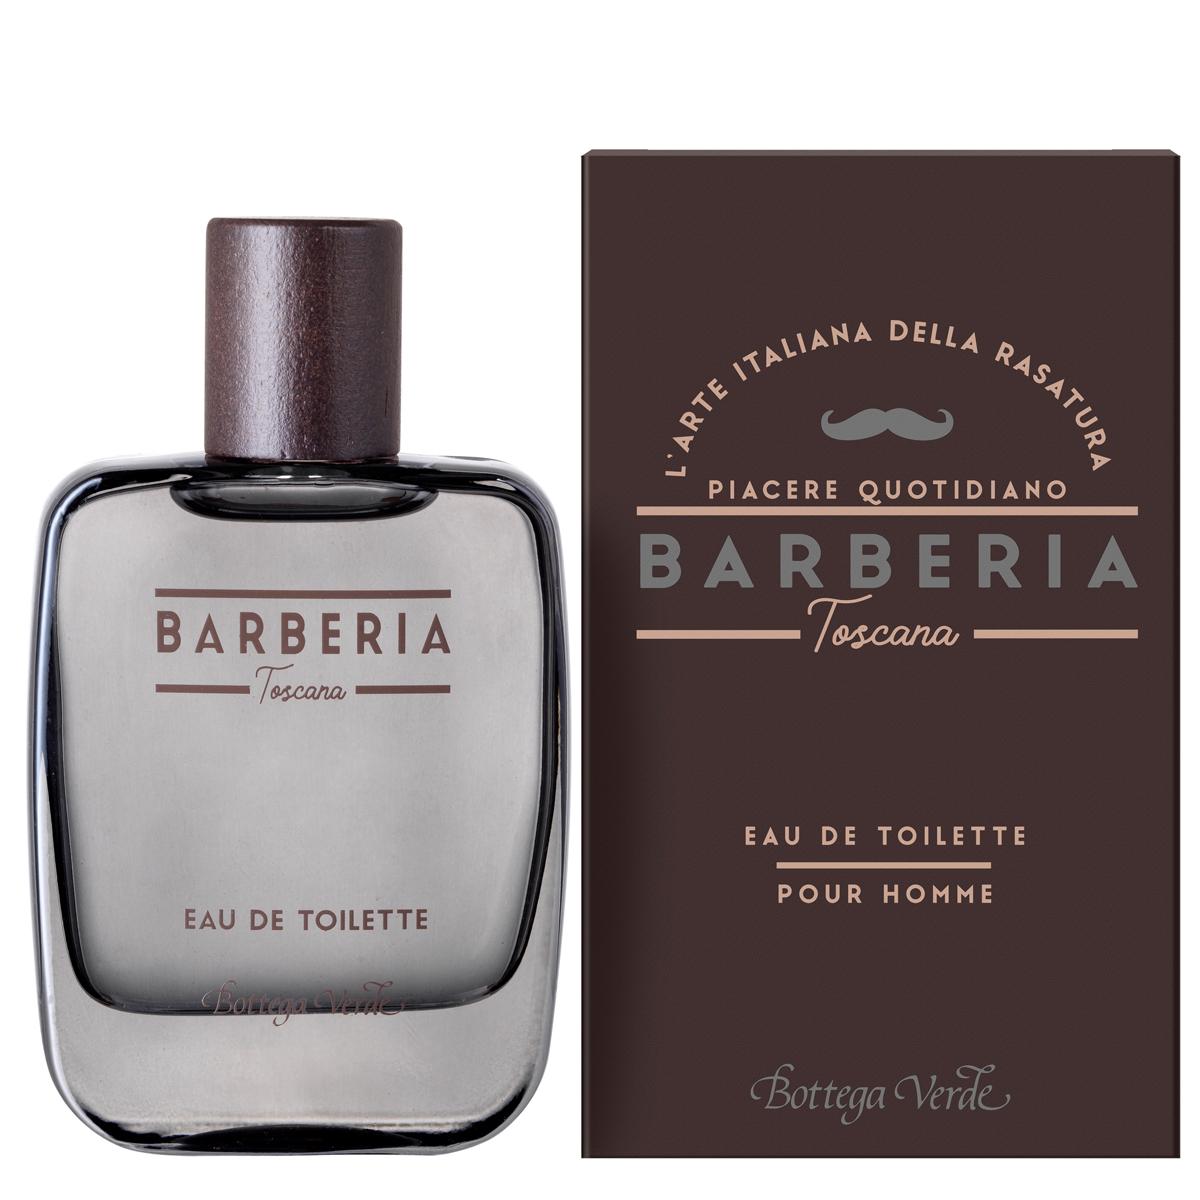 Barberia Toscana - Apa De Toaleta